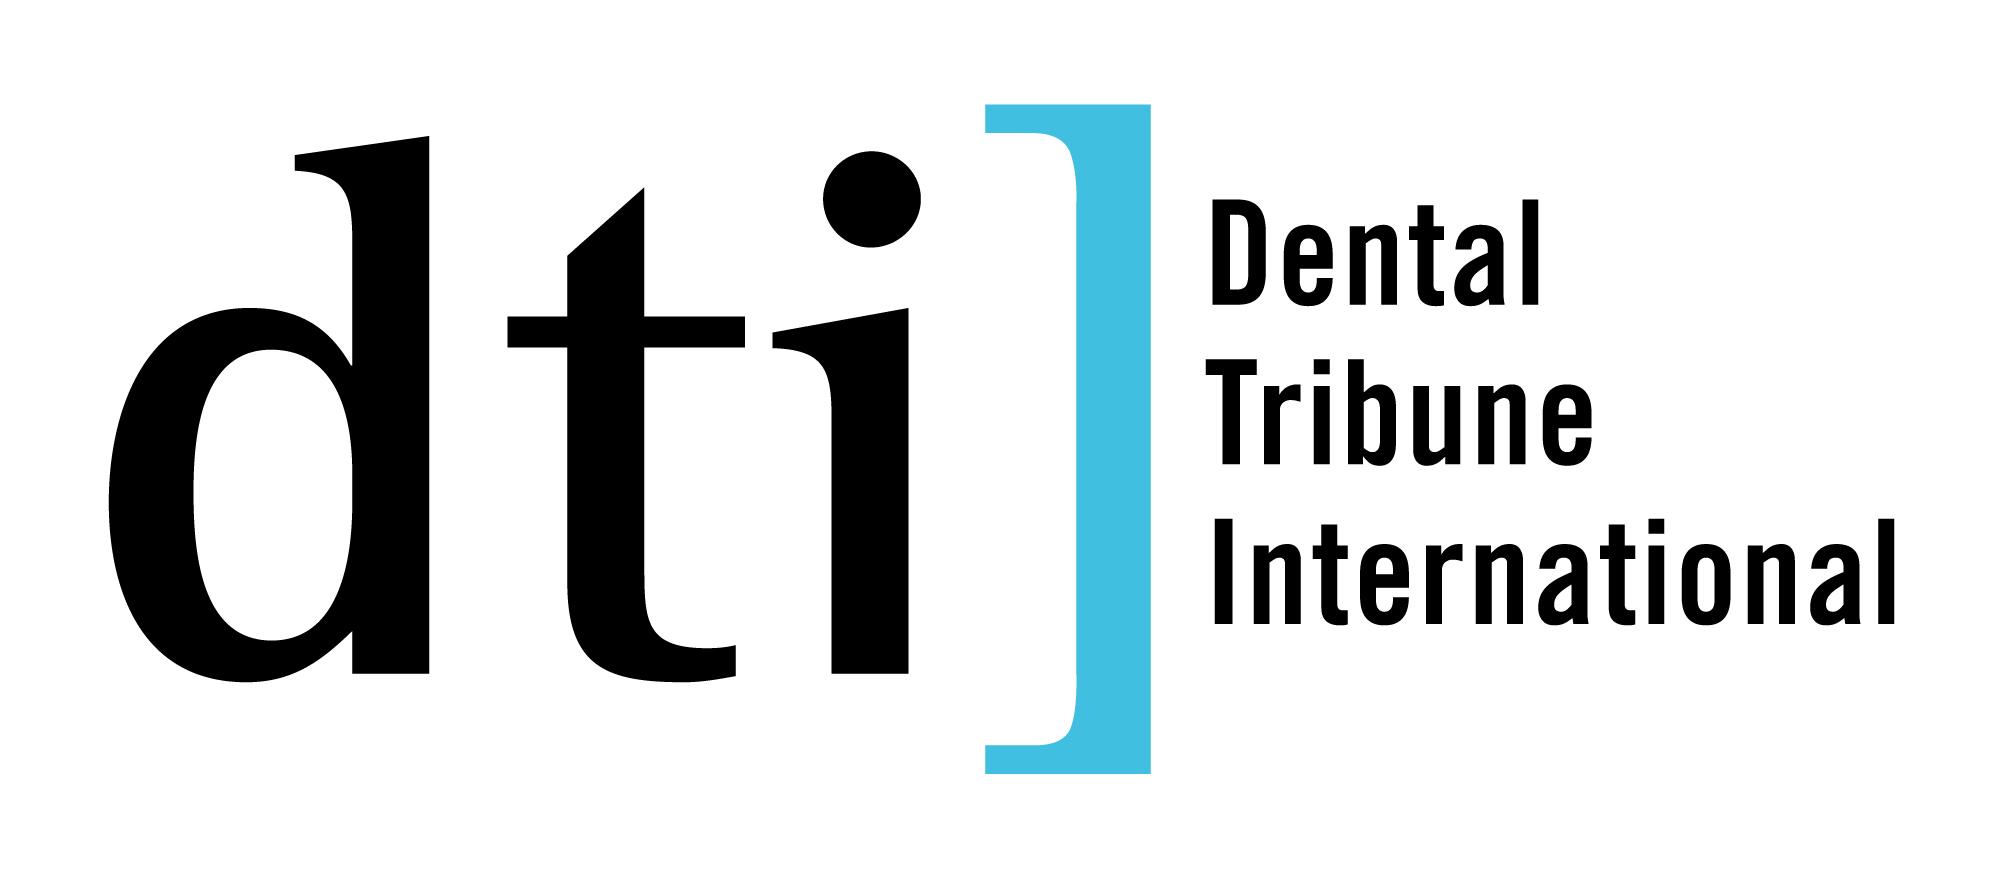 Dental Tribune International